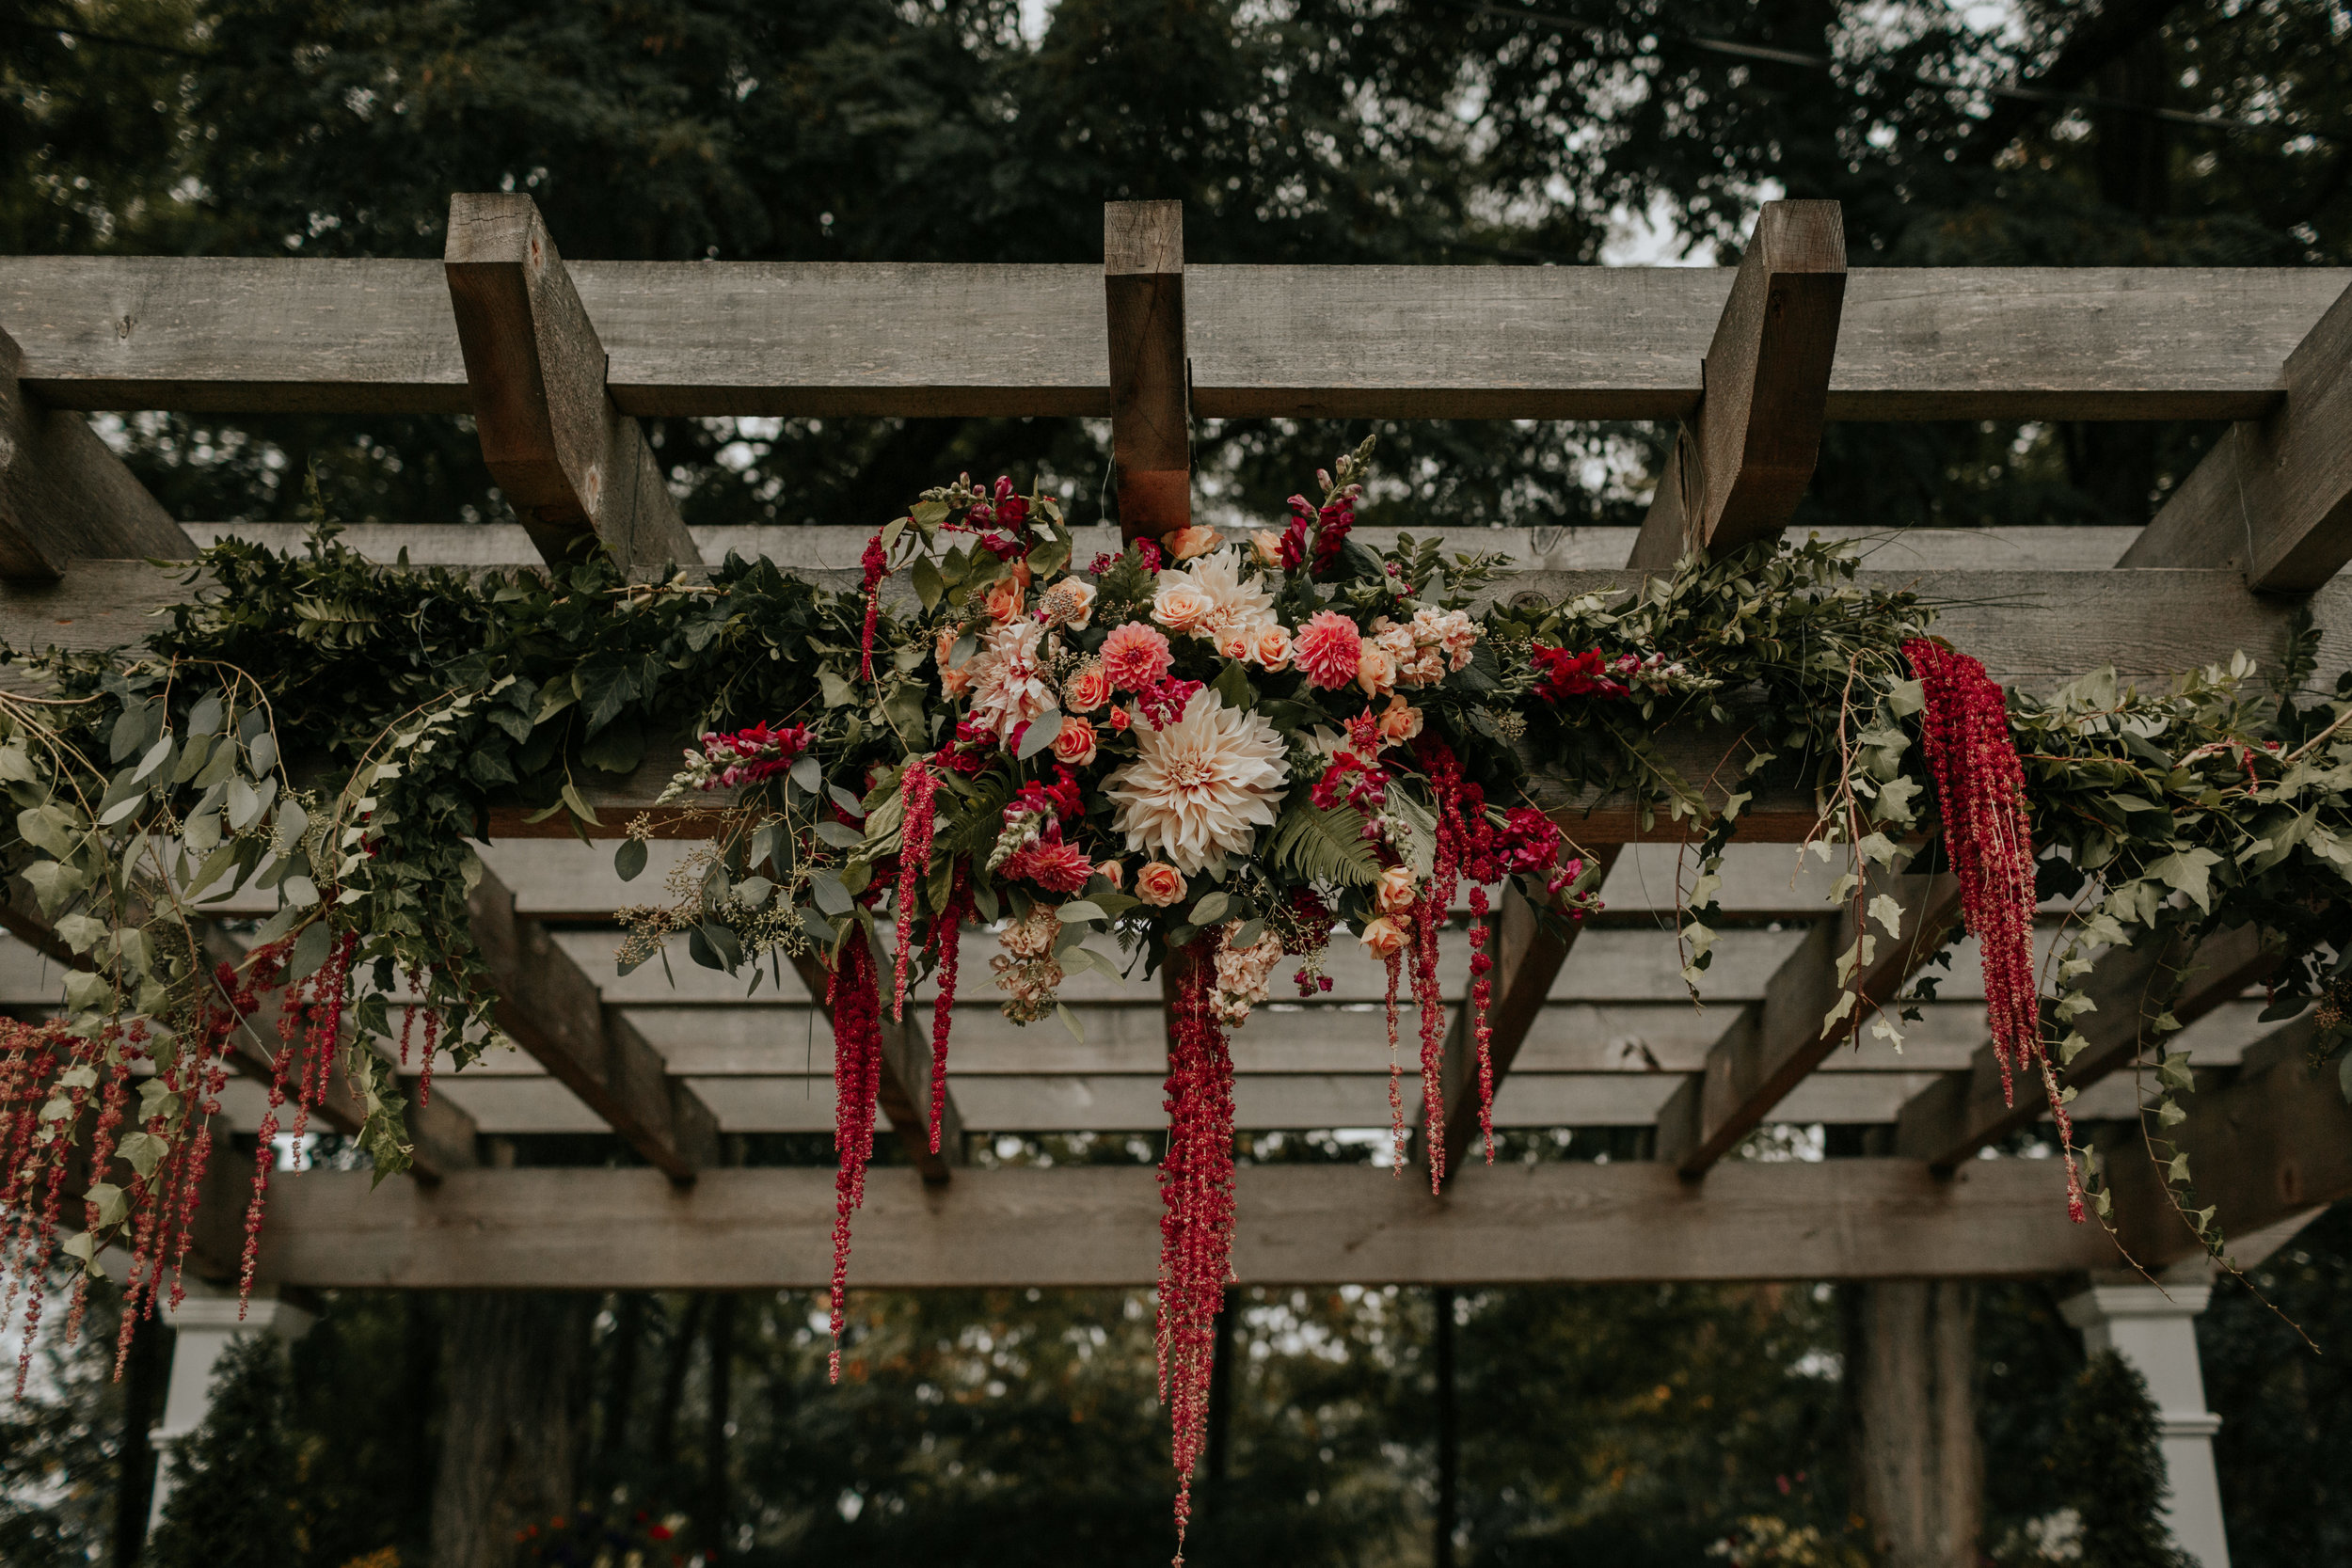 ginapaulson_jakitrevor_wedding-451.jpg